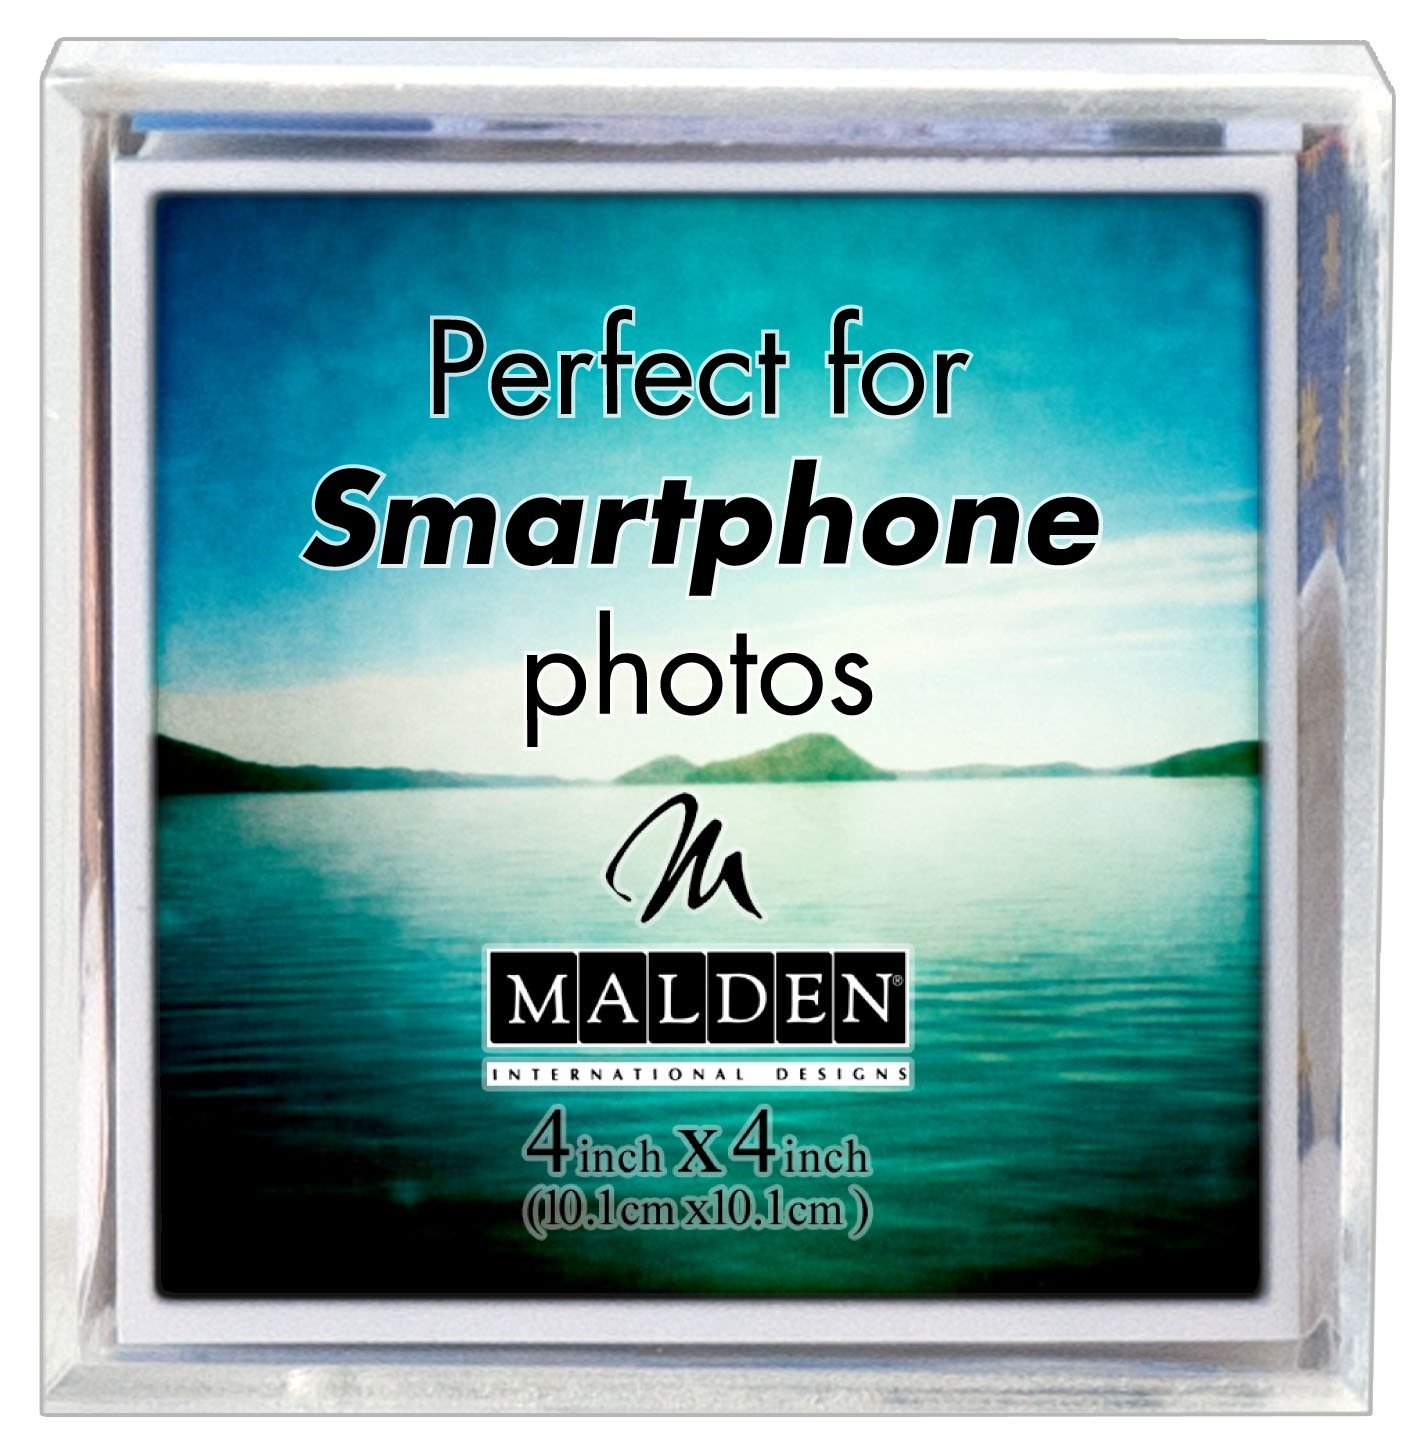 Malden International Designs Acrylic Photo Cube, 6 Option...